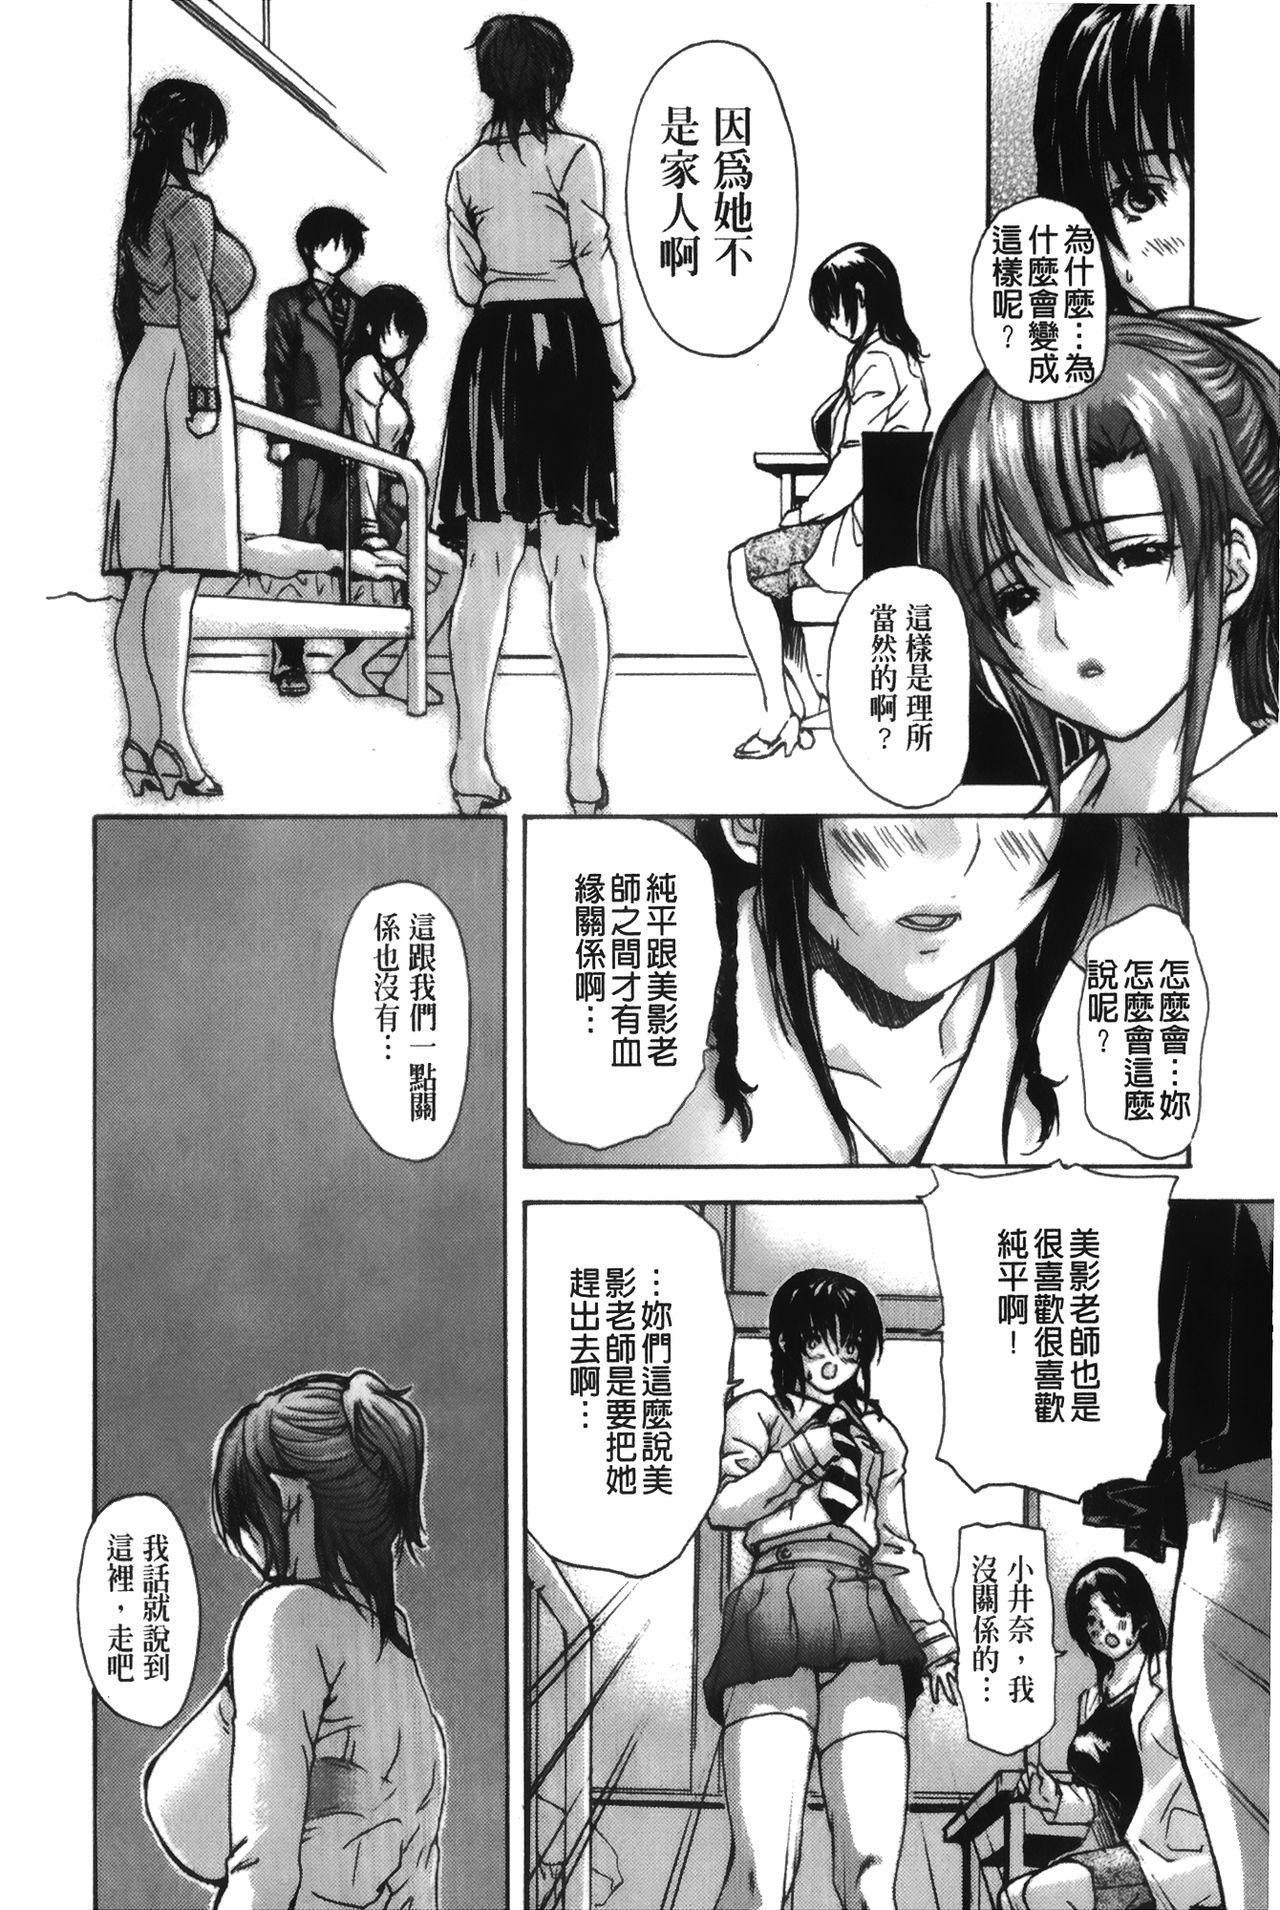 Tonari no Minano Sensei 4 | 隔壁的美奈乃老師 4 173